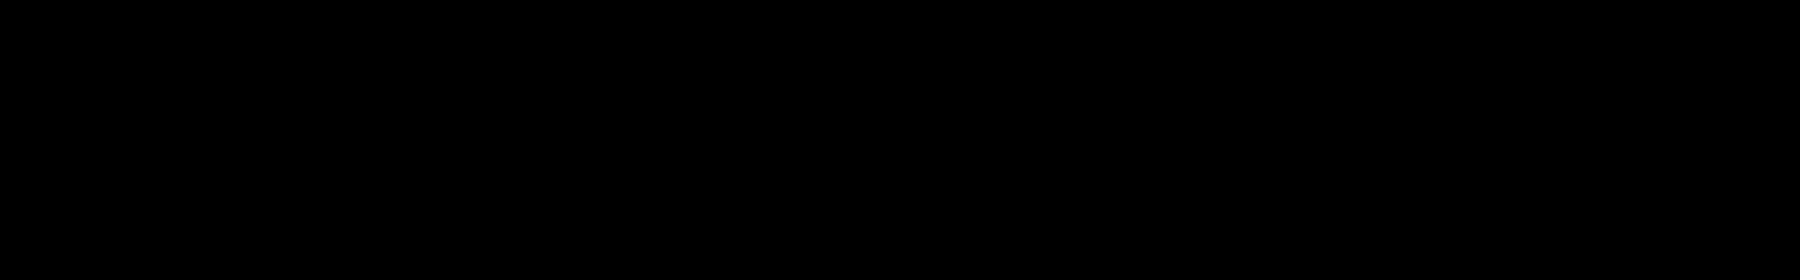 Eff-X audio waveform